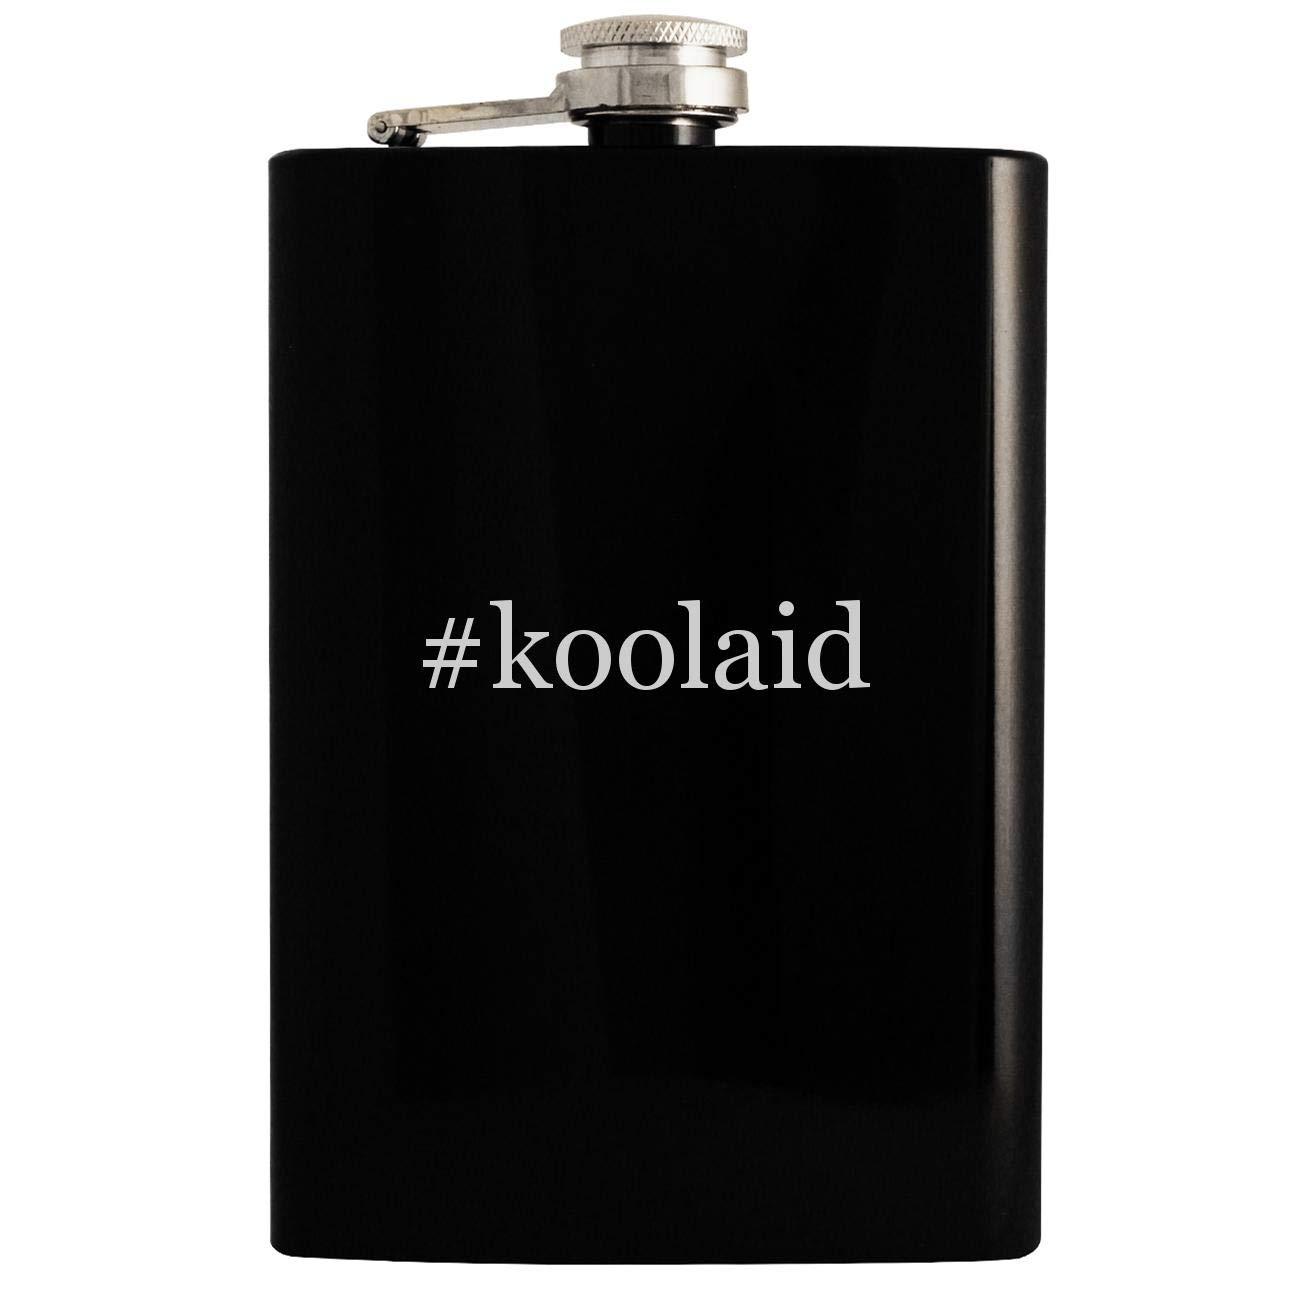 #koolaid - 8oz Hashtag Hip Drinking Alcohol Flask, Black